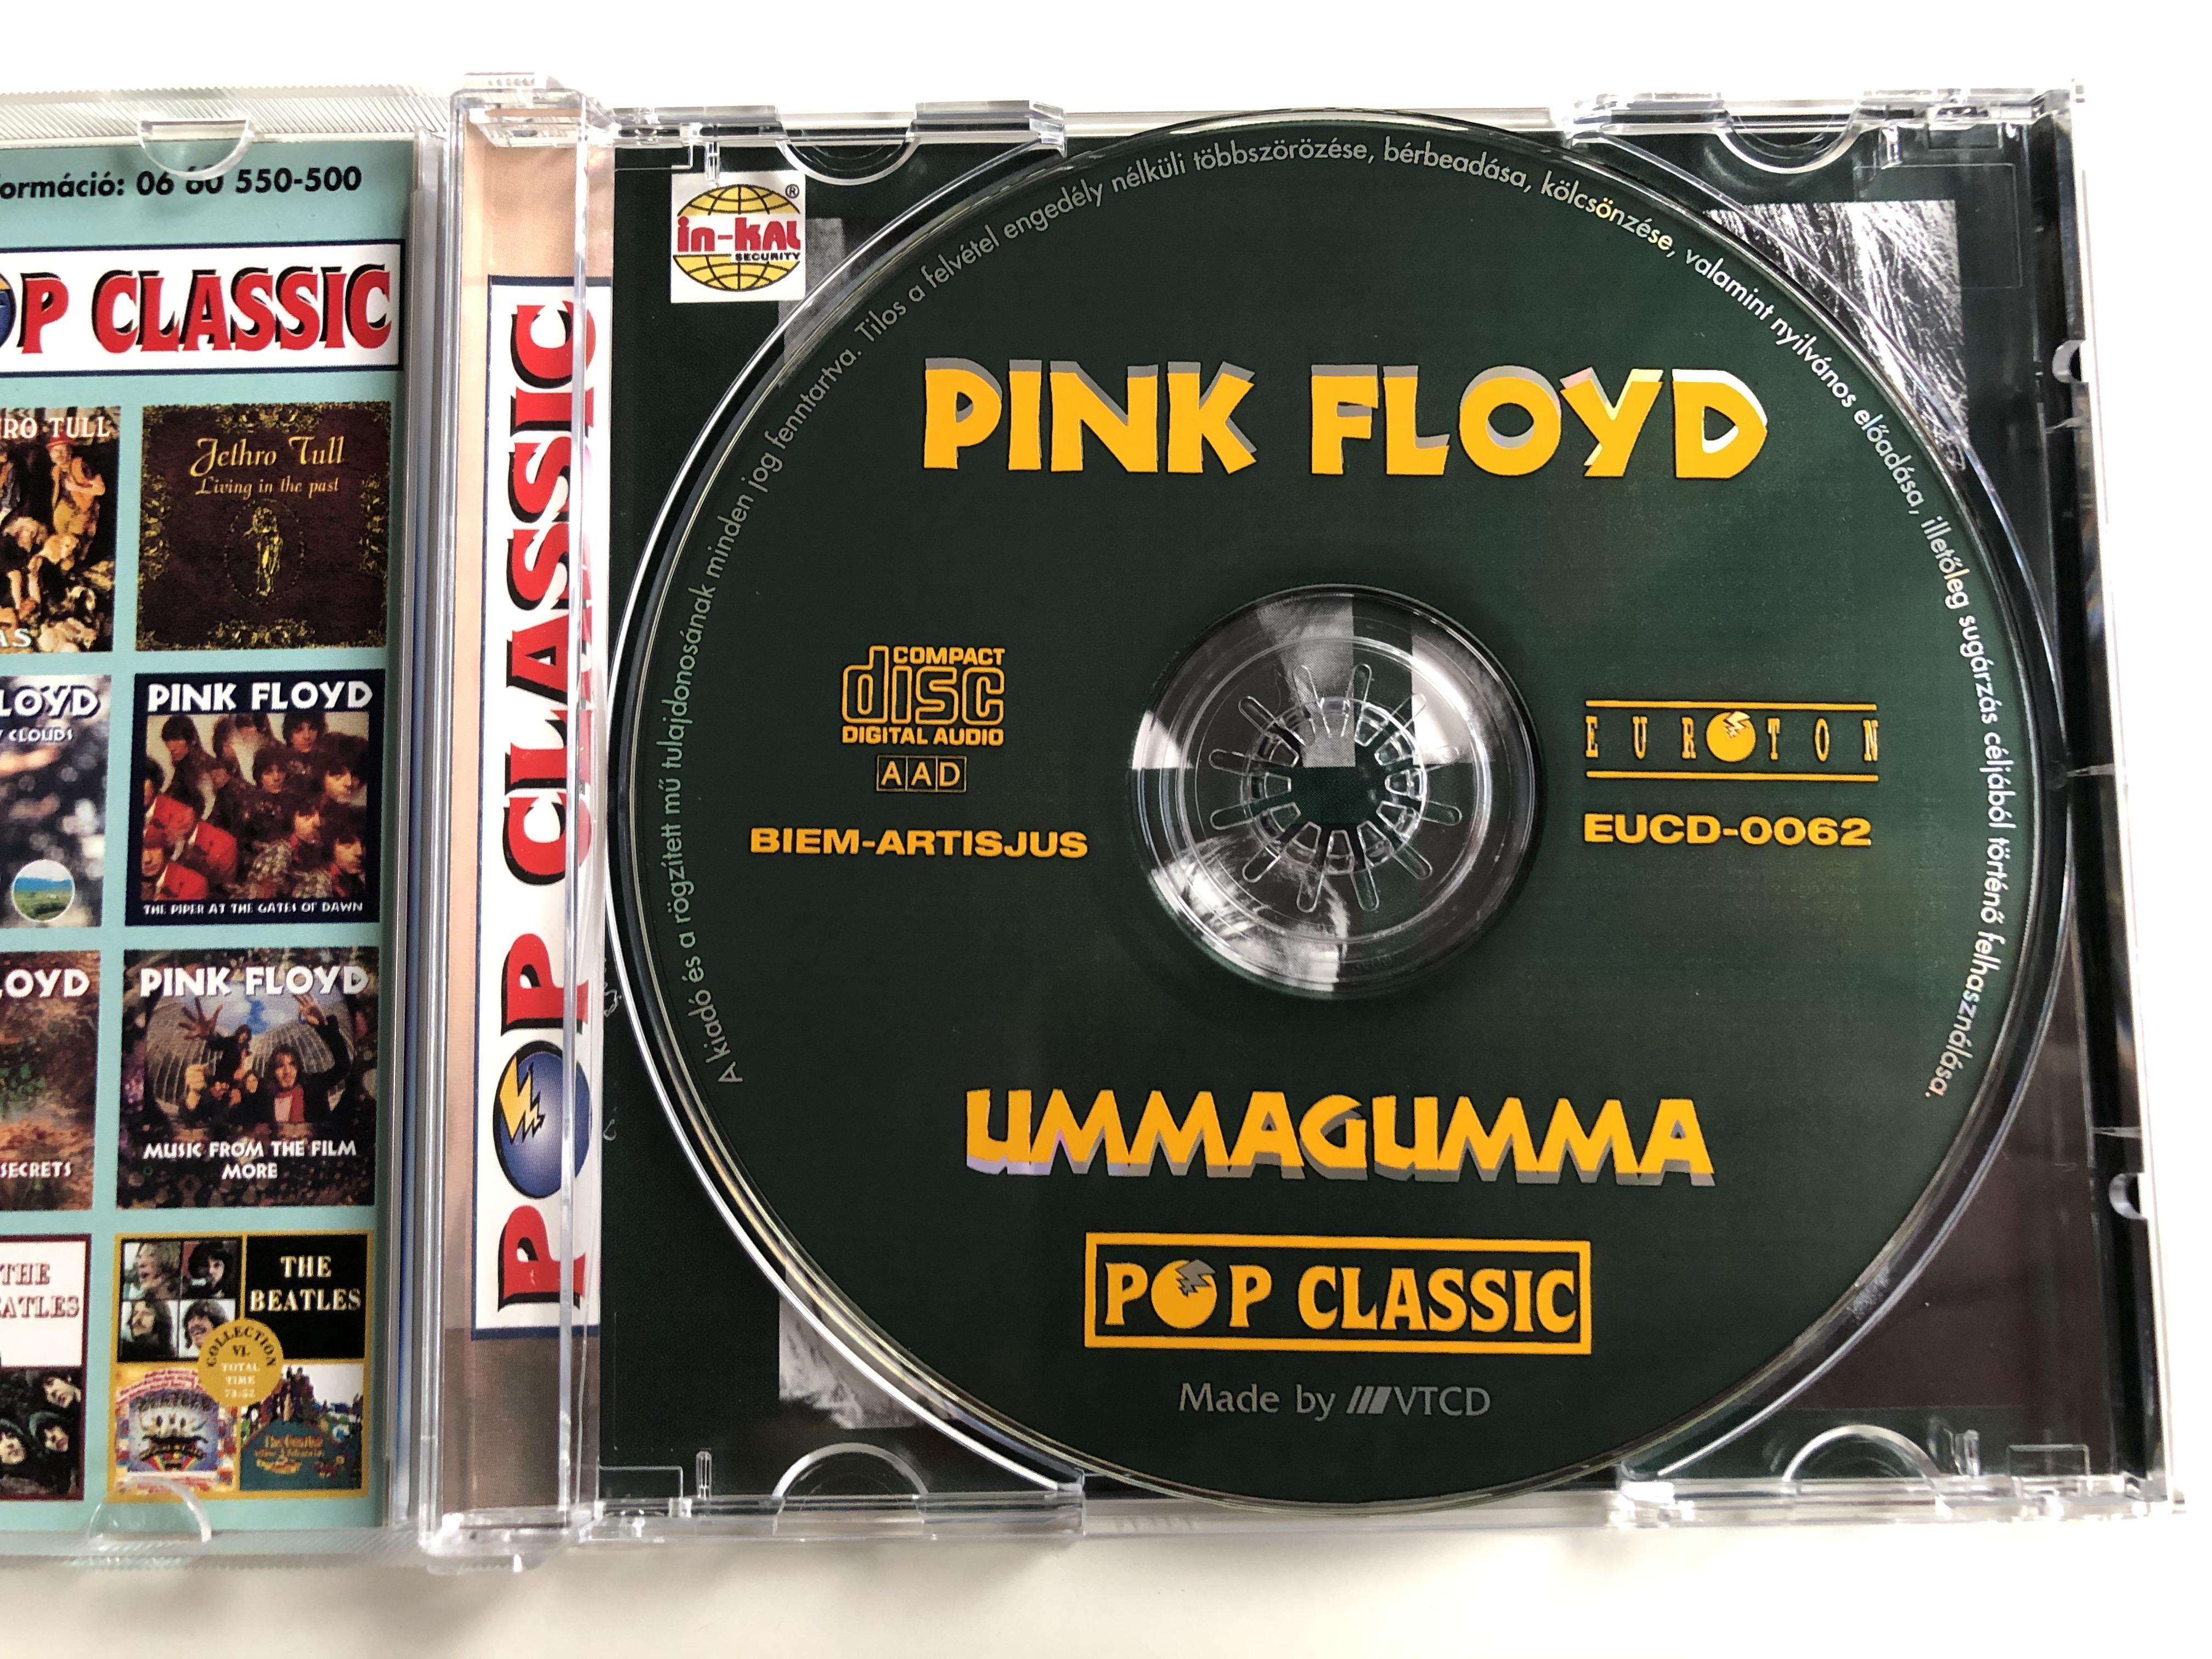 pink-floyd-ummagumma-pop-classic-euroton-audio-cd-eucd-0062-2-.jpg